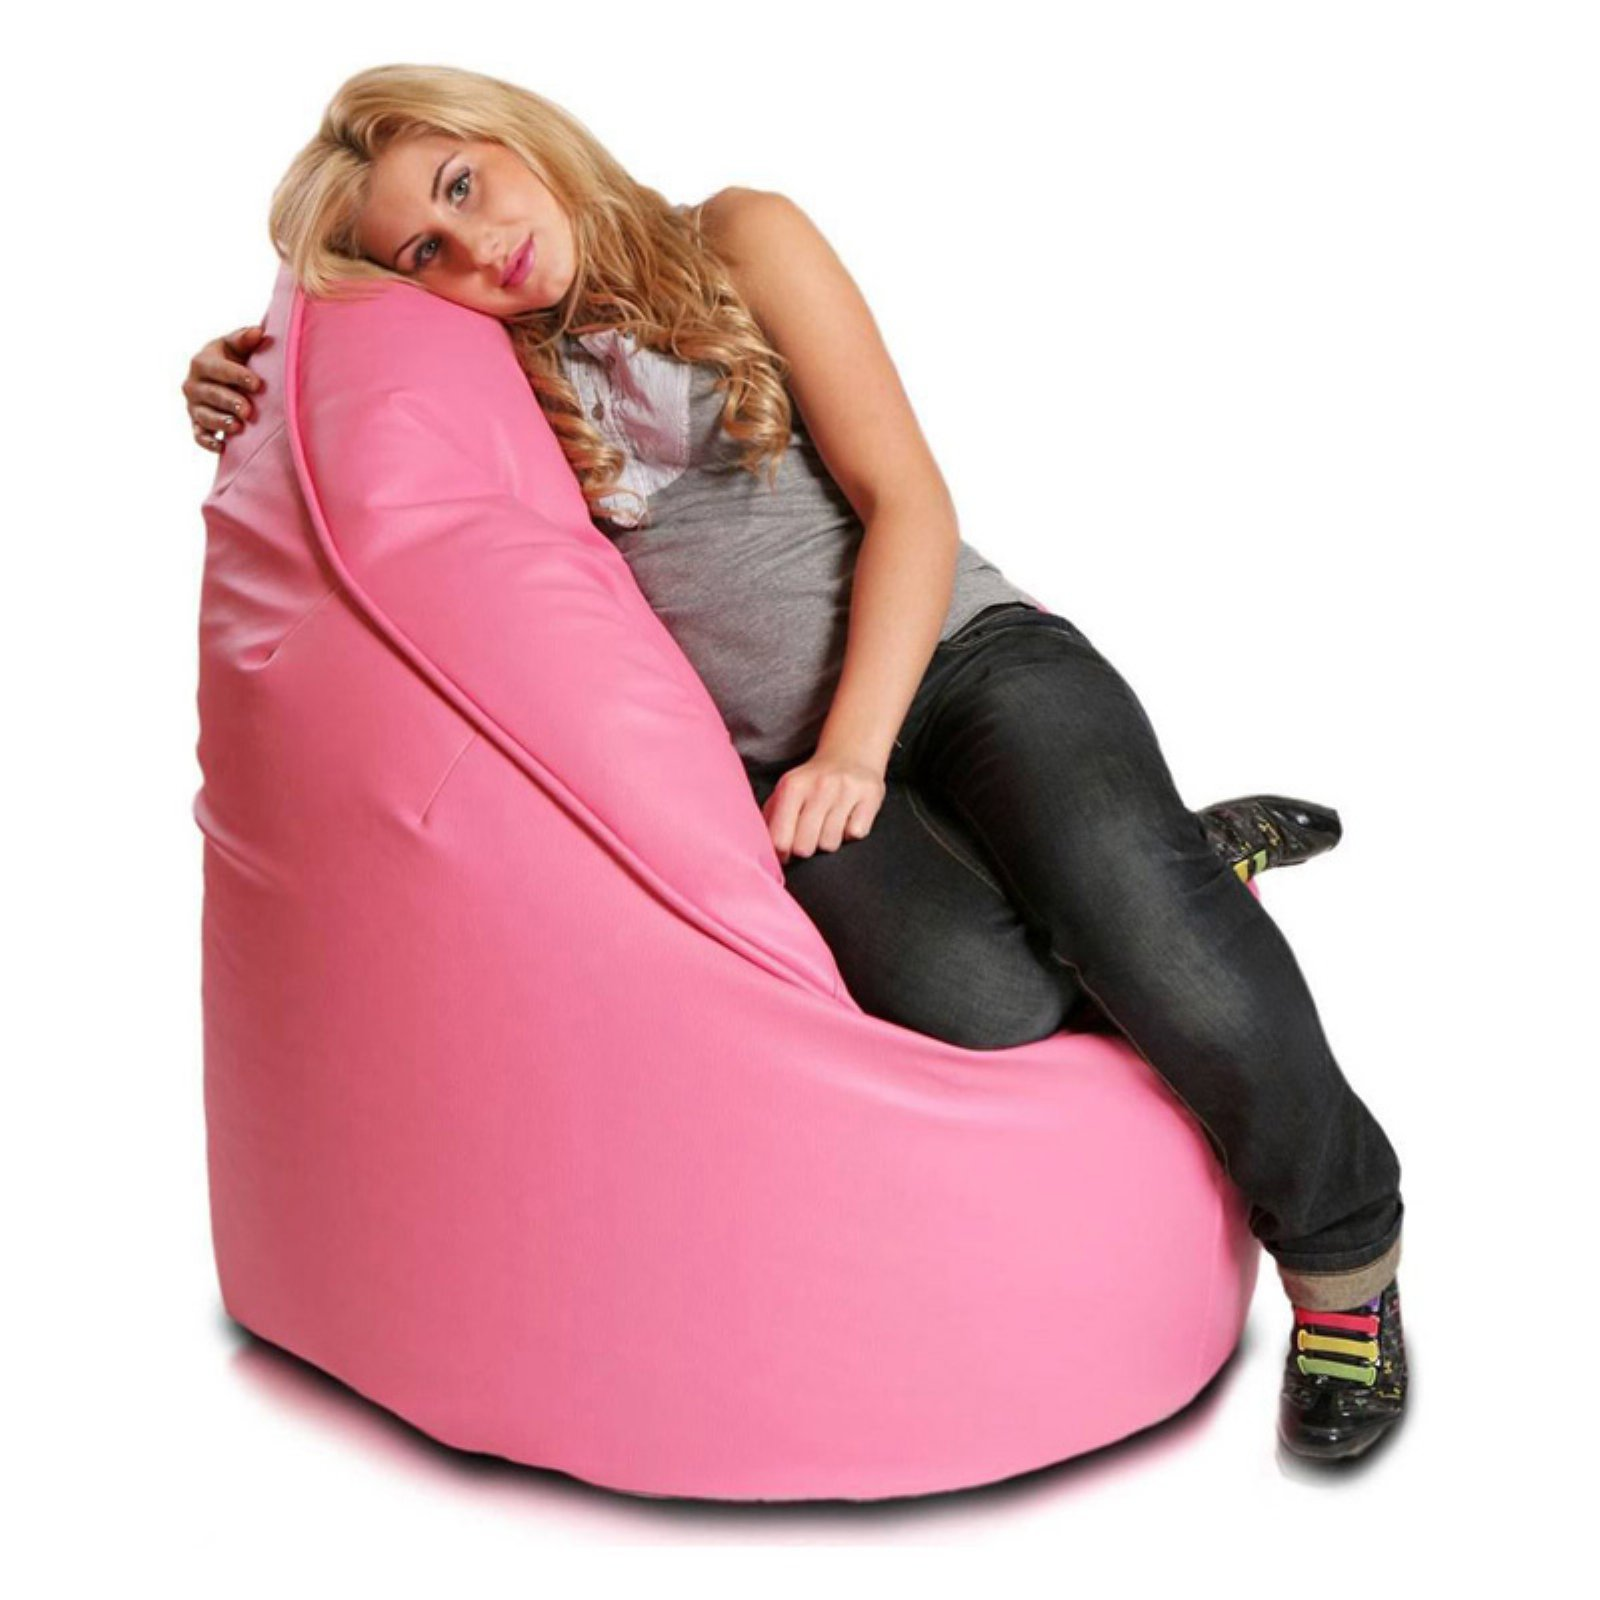 Turbo Beanbags Leader Large Bean Bag Chair